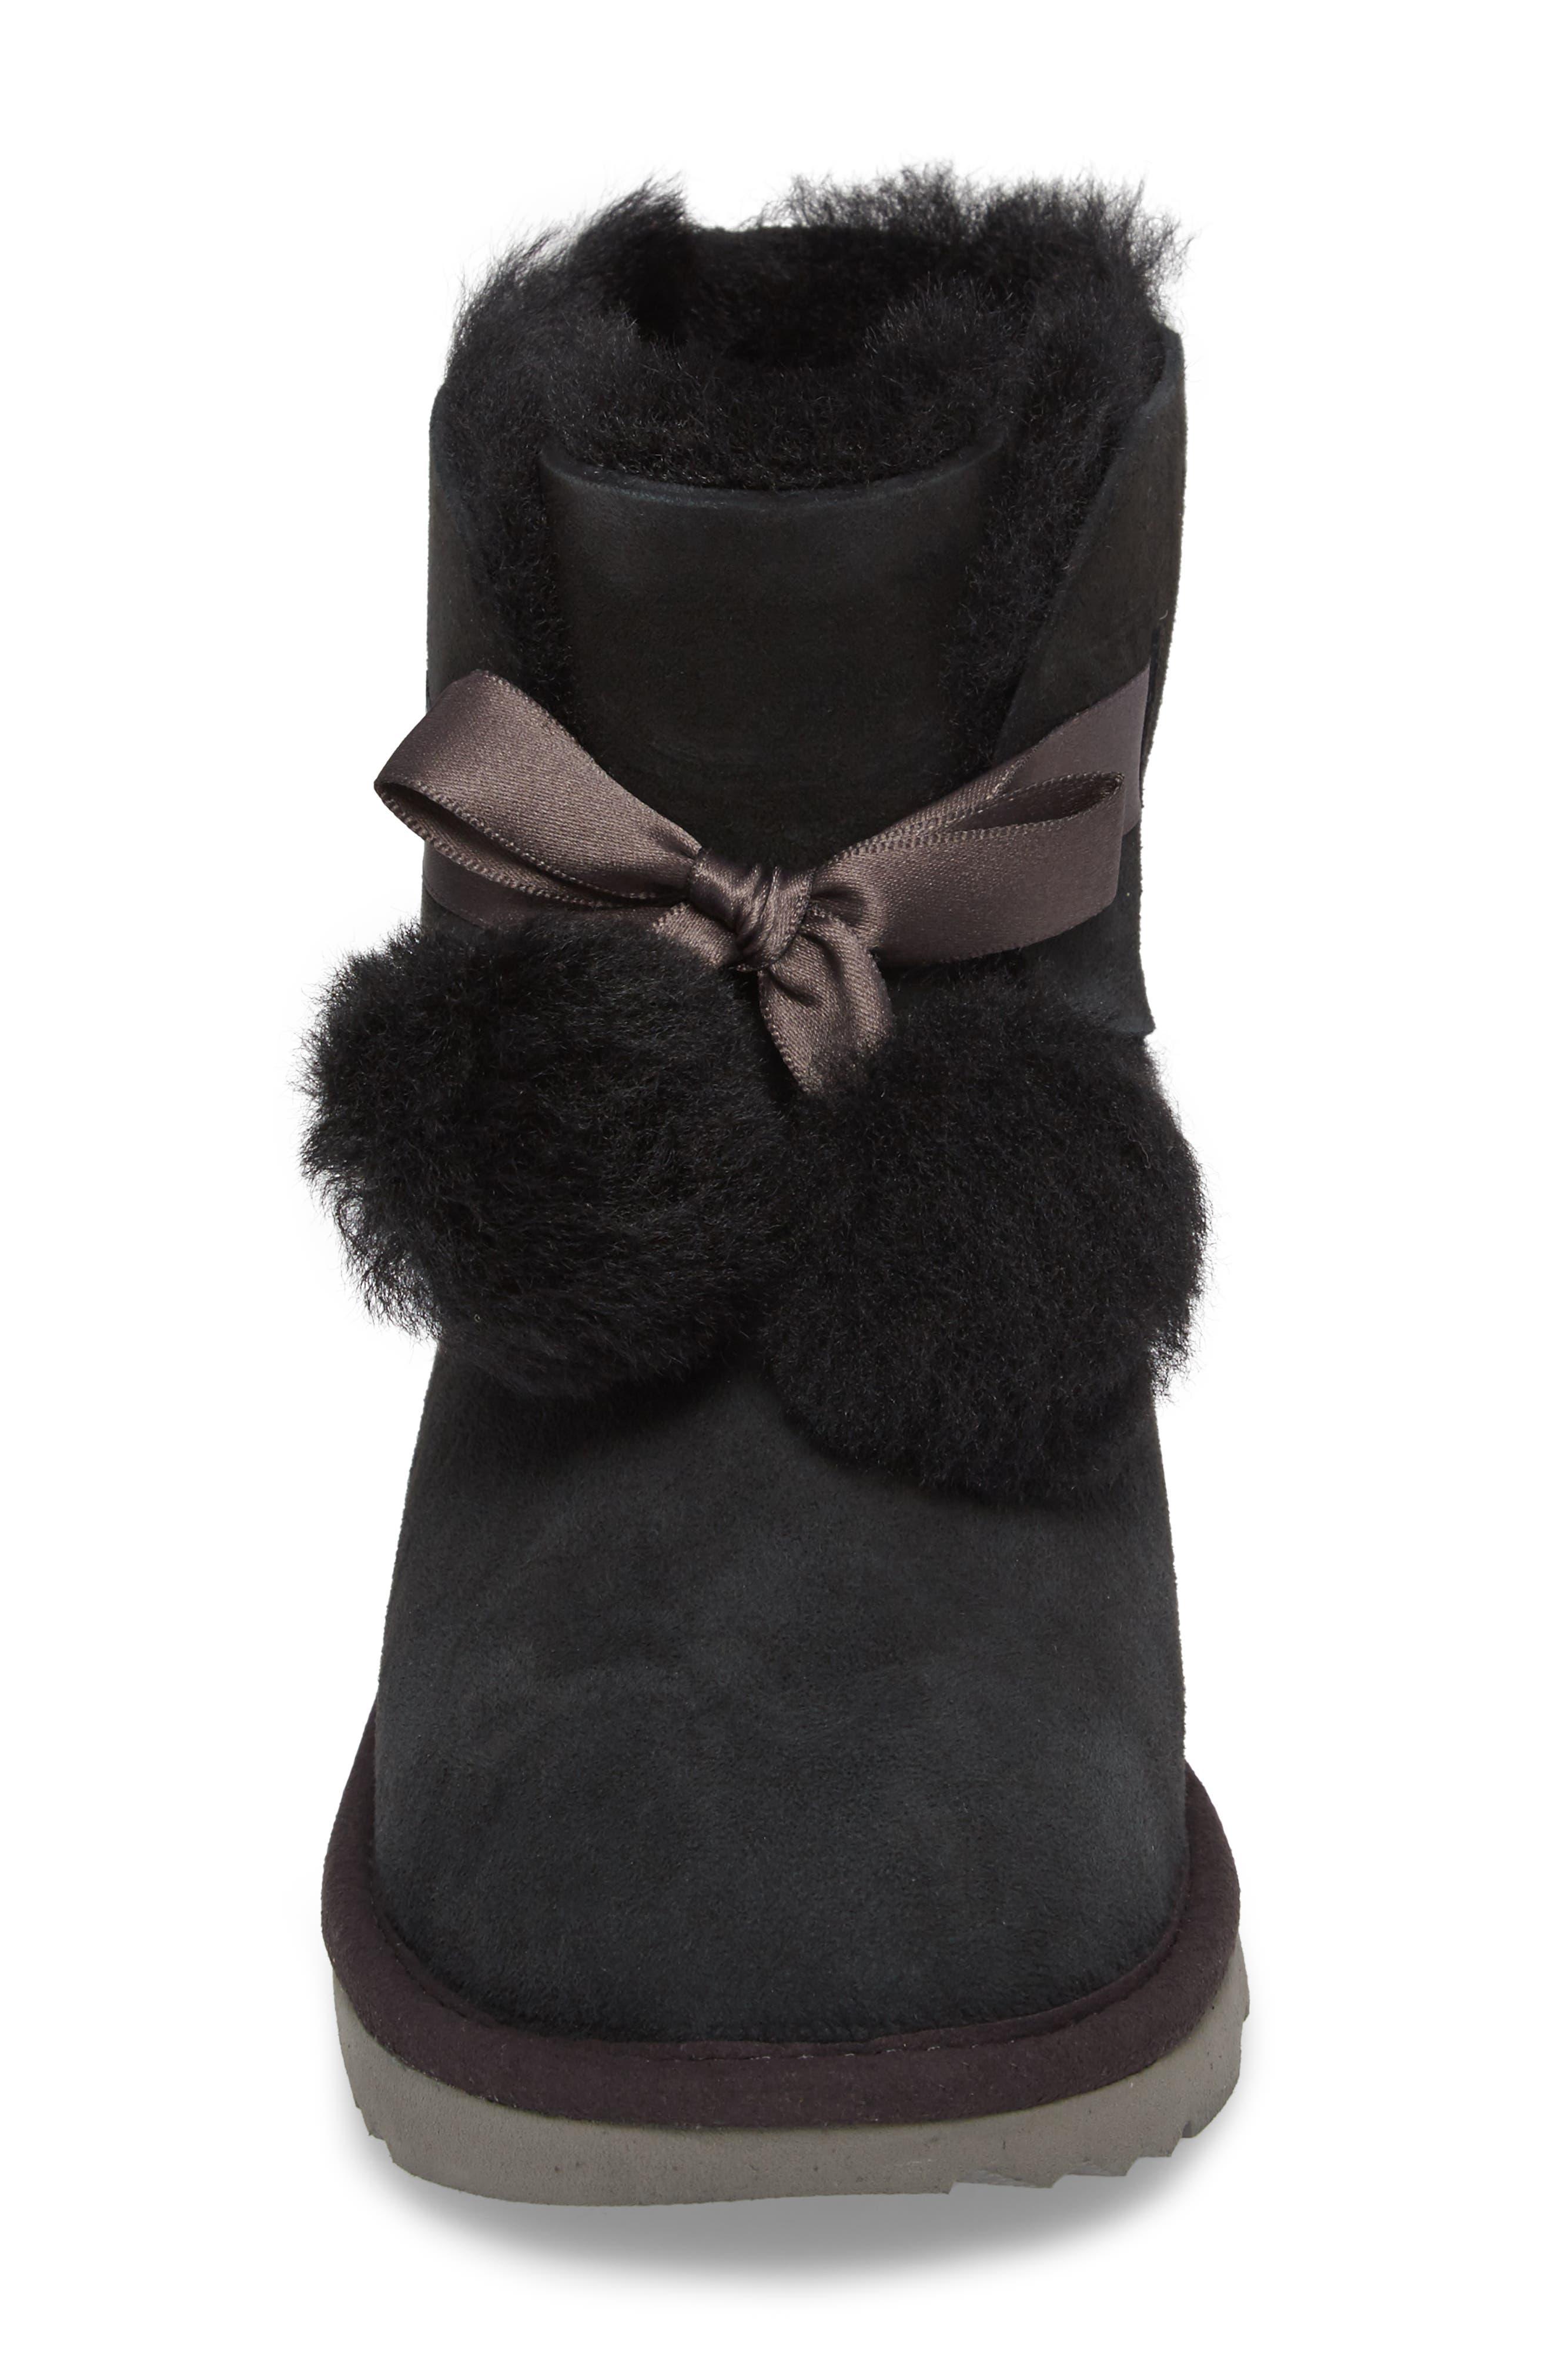 Gita Water-Resistant Genuine Shearling Pom Bootie,                             Alternate thumbnail 4, color,                             Black